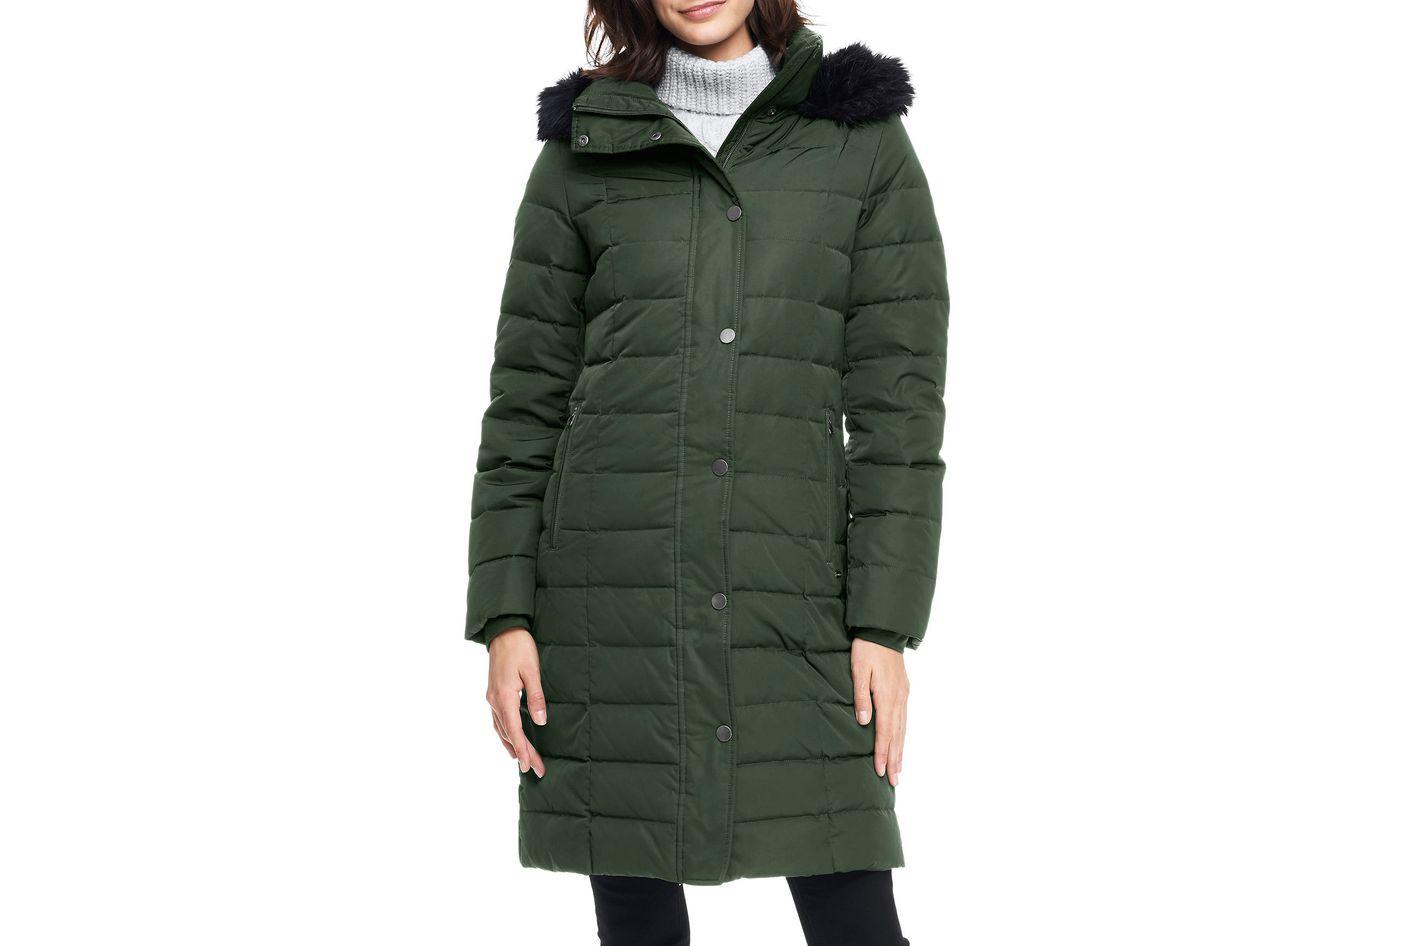 Land's End Women's Luxe Long Down Coat